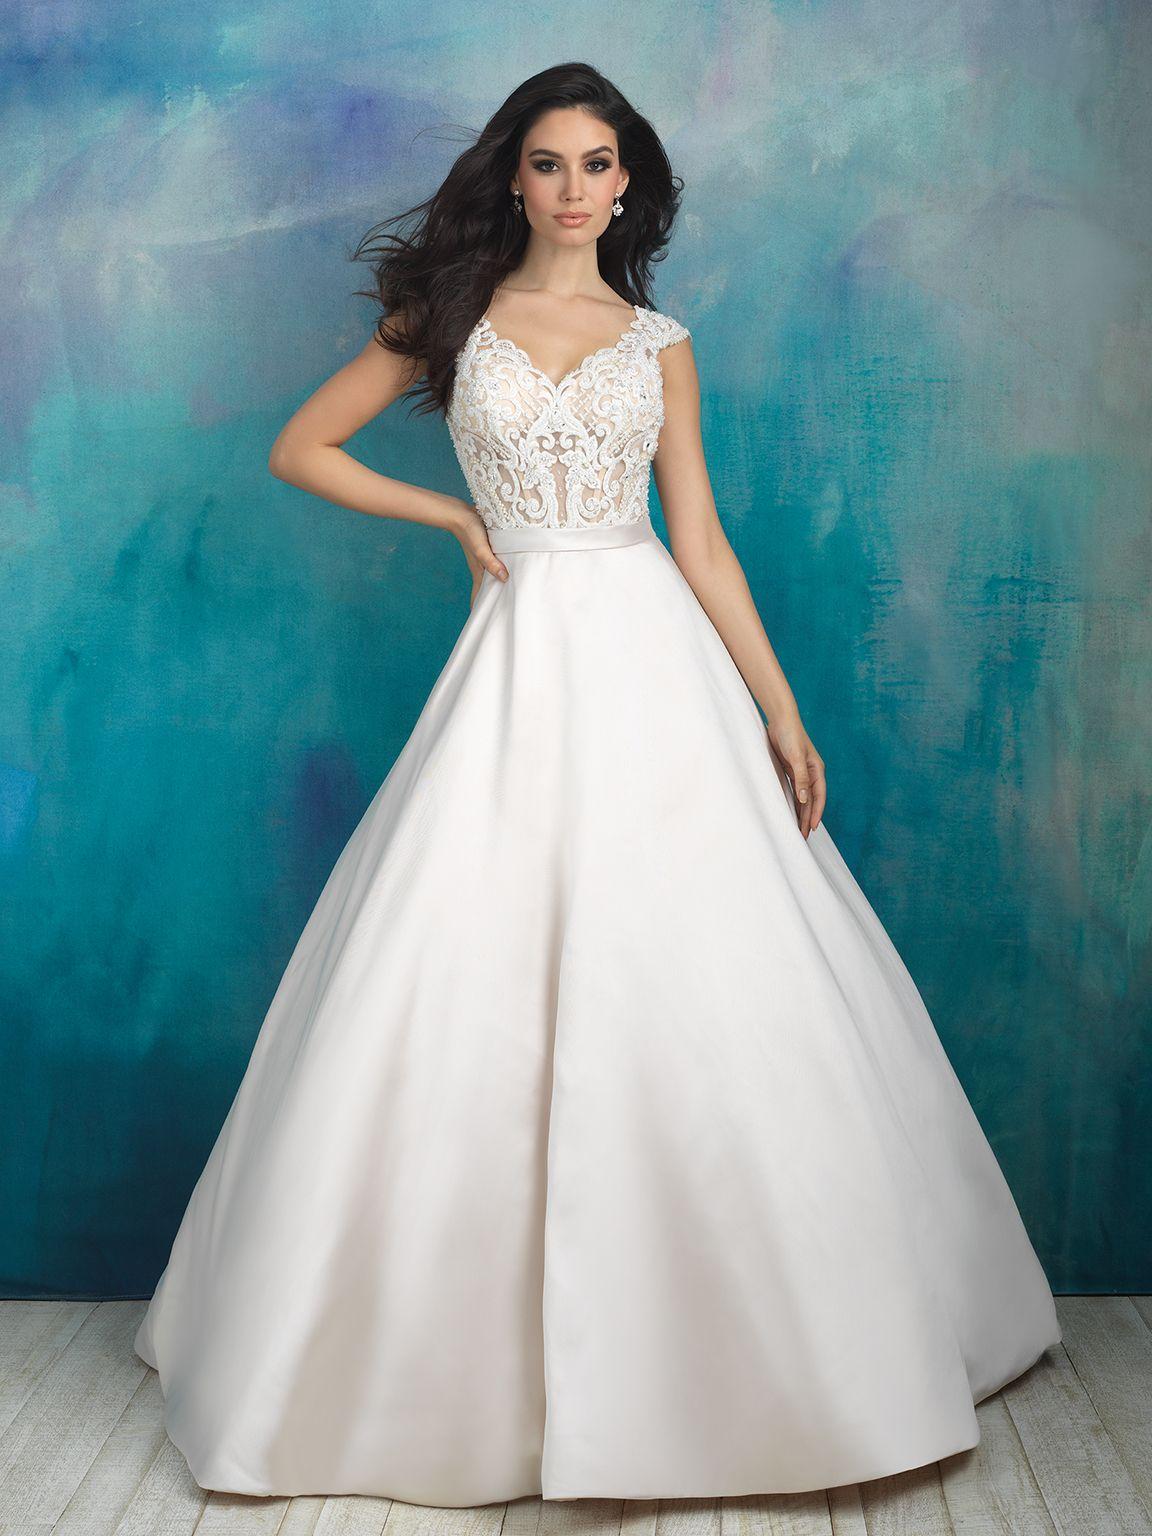 cc1bf8984cea1 Wedding Dresses Online | Bridesmaid Dresses | House of Brides